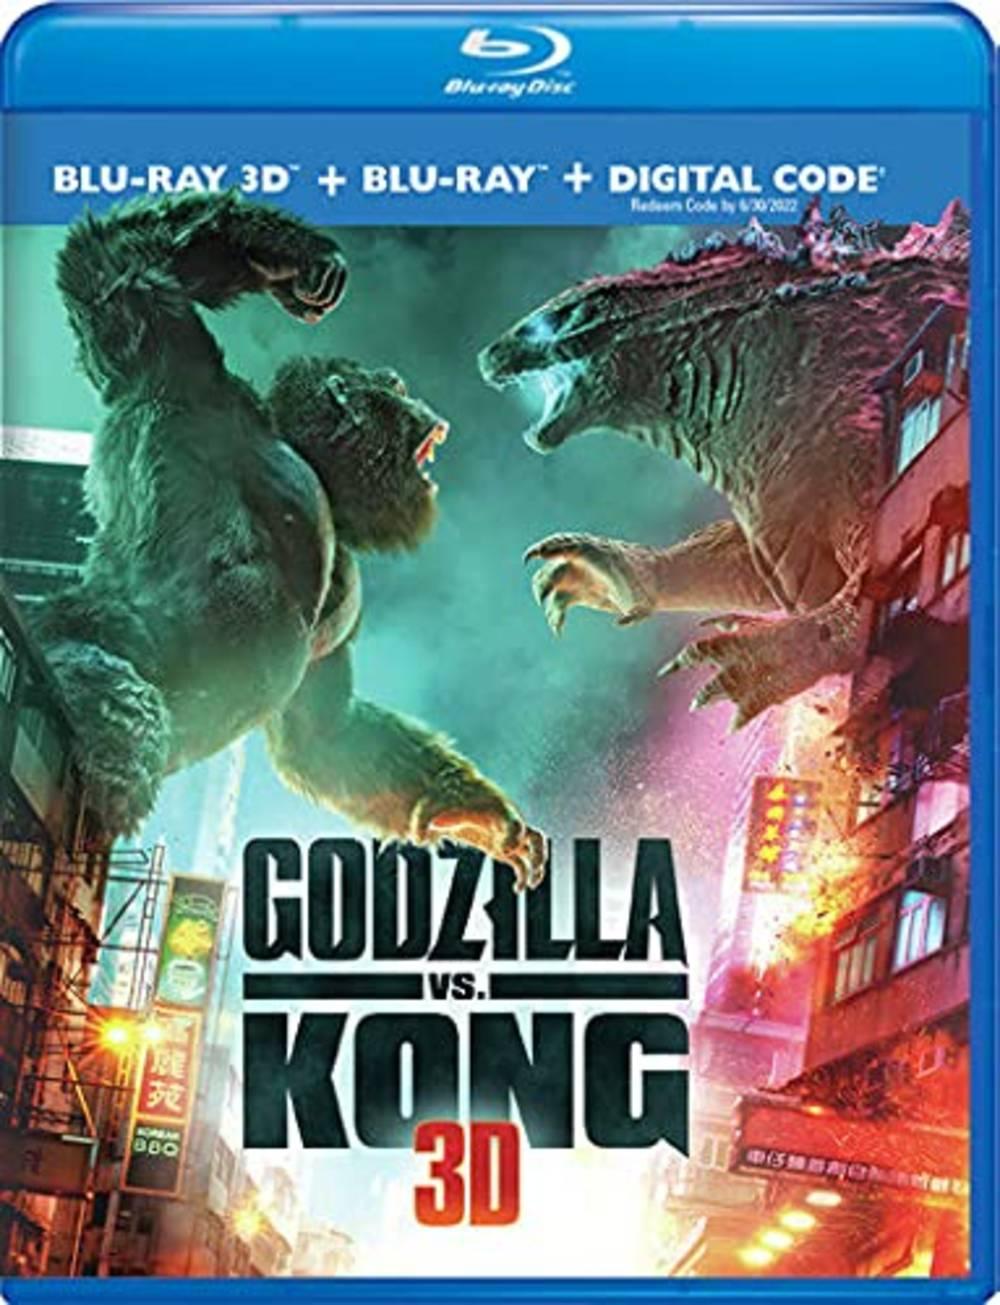 Godzilla [Movie] - Godzilla vs. Kong [3D]